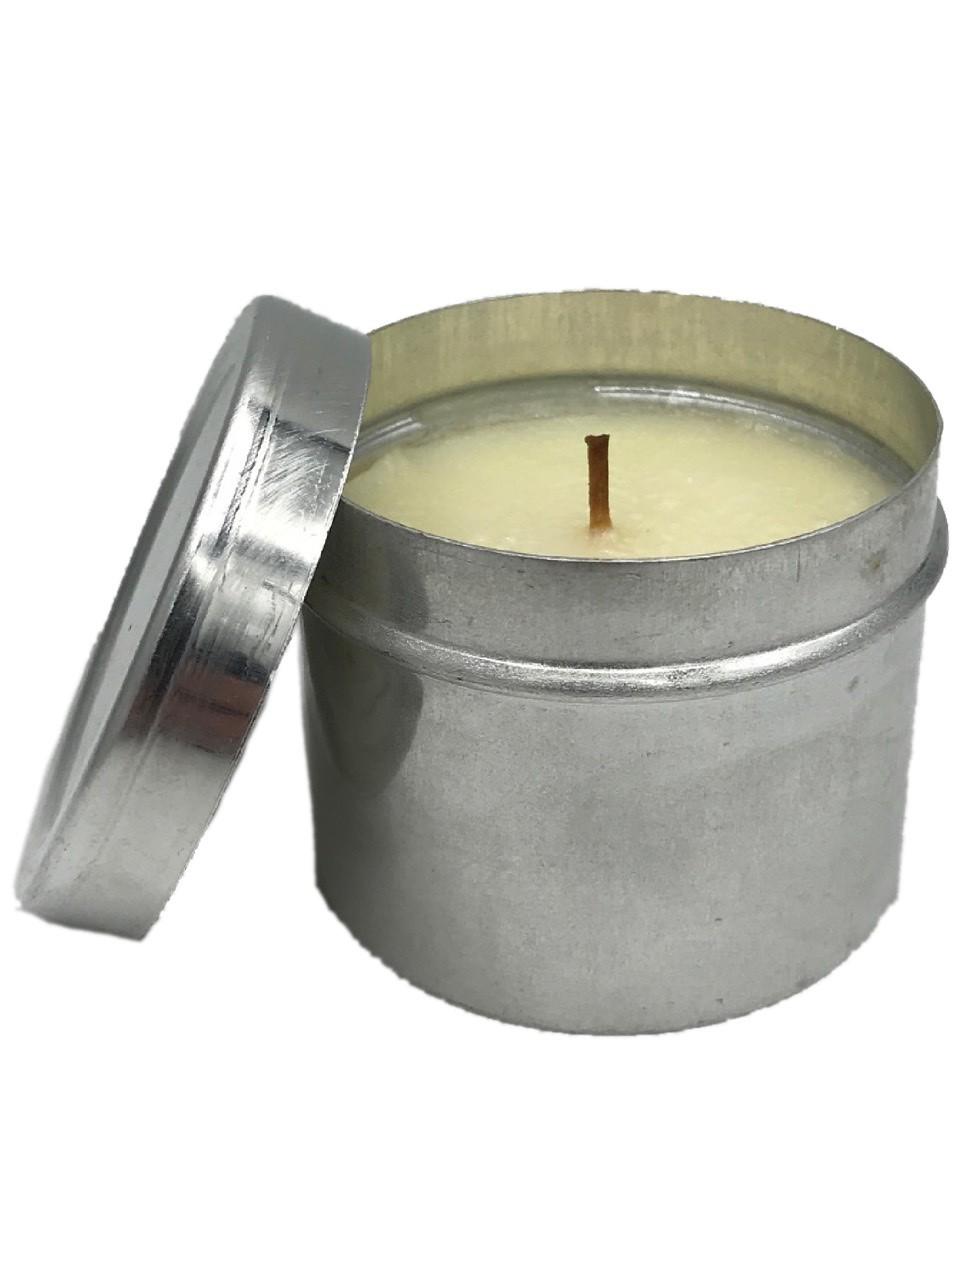 Tuberose Scented candle 85 gr